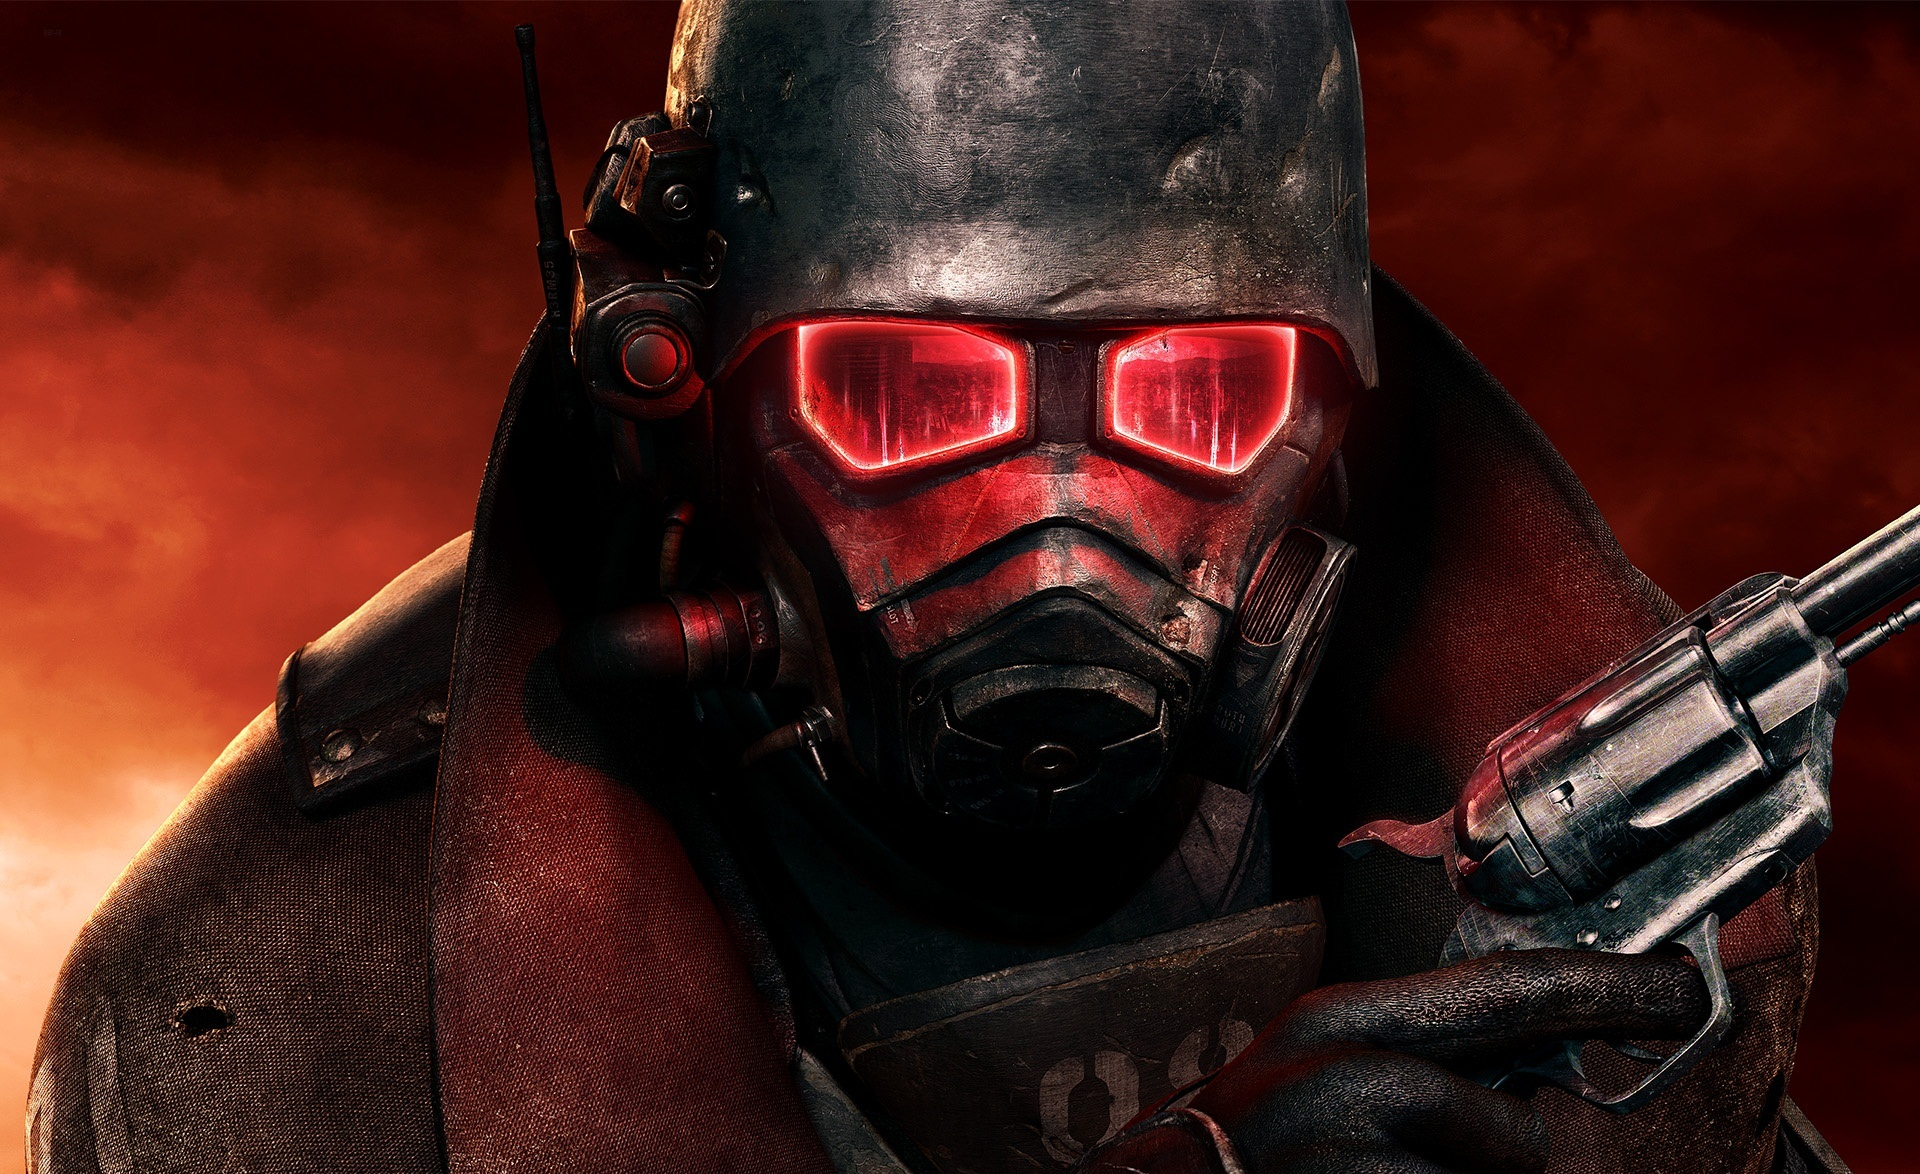 Games_Fallout_New_Vegas_022413_.jpg - -